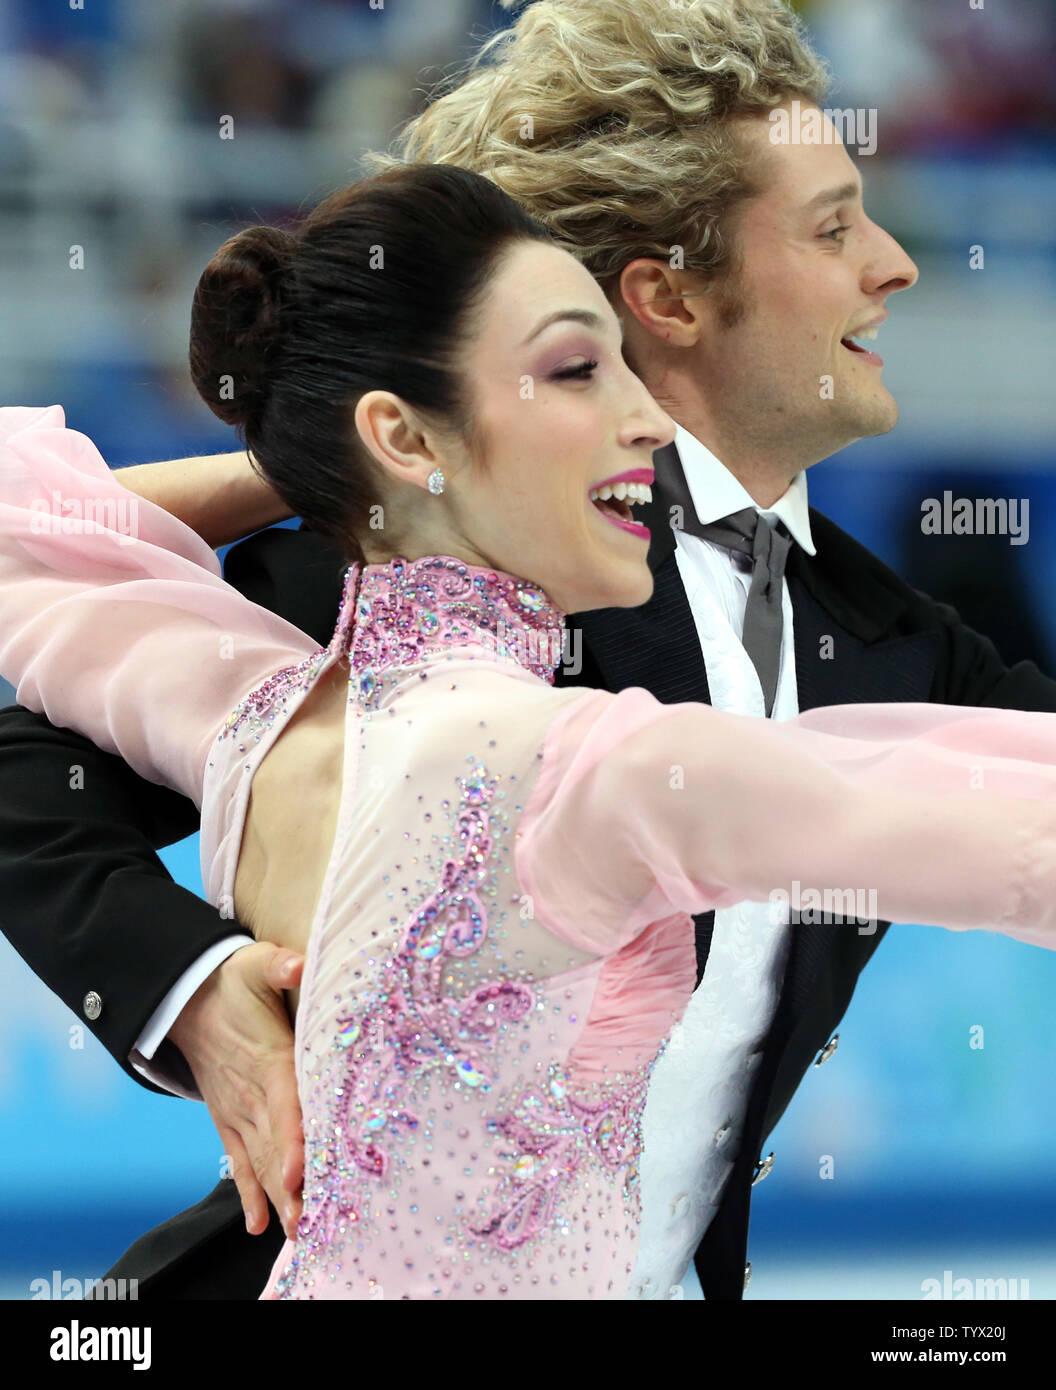 Elena et Nikita patinage datant Christian se mêlent rencontres gratuites